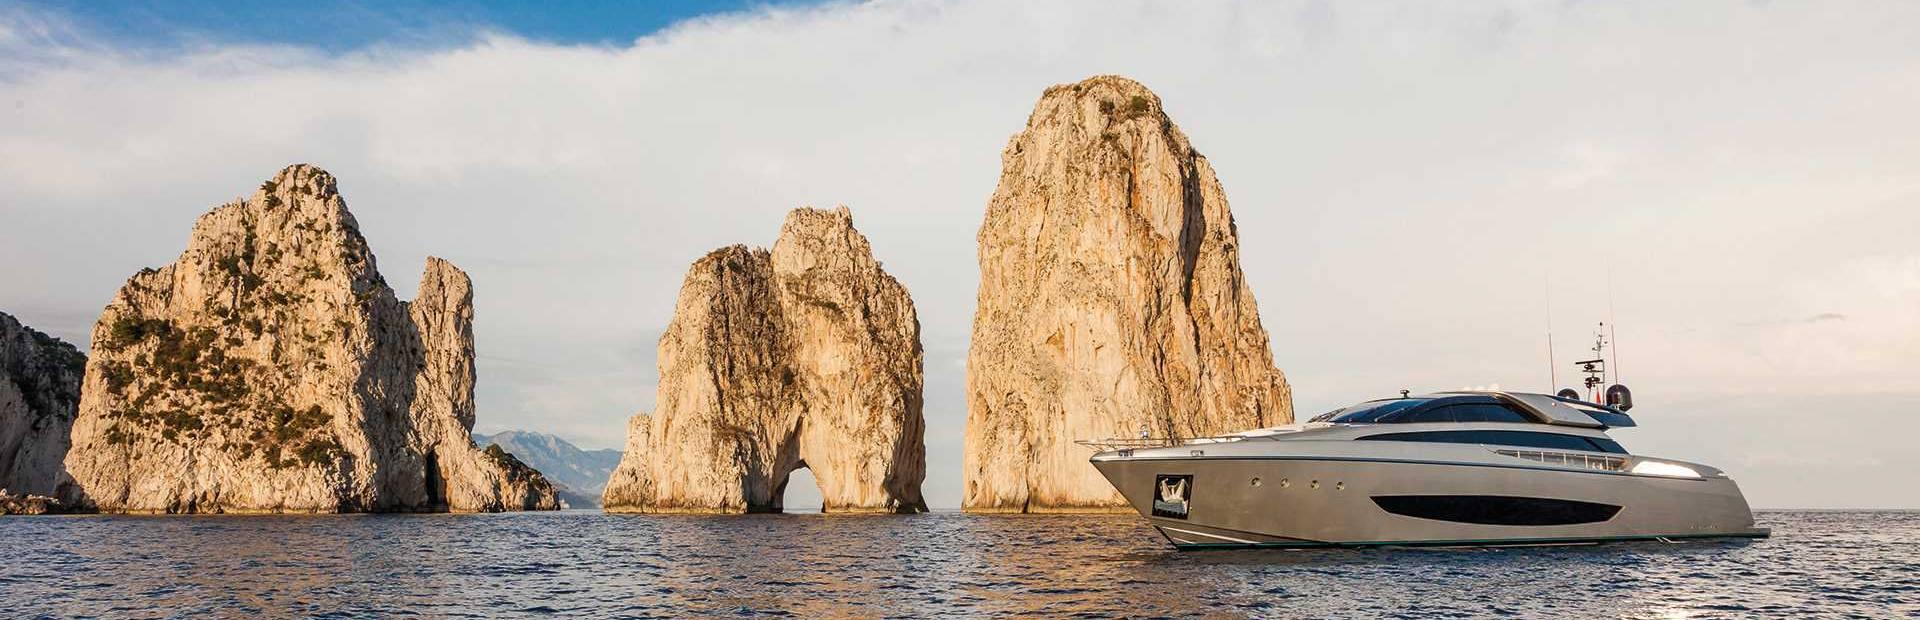 122' Mythos Yacht Charter